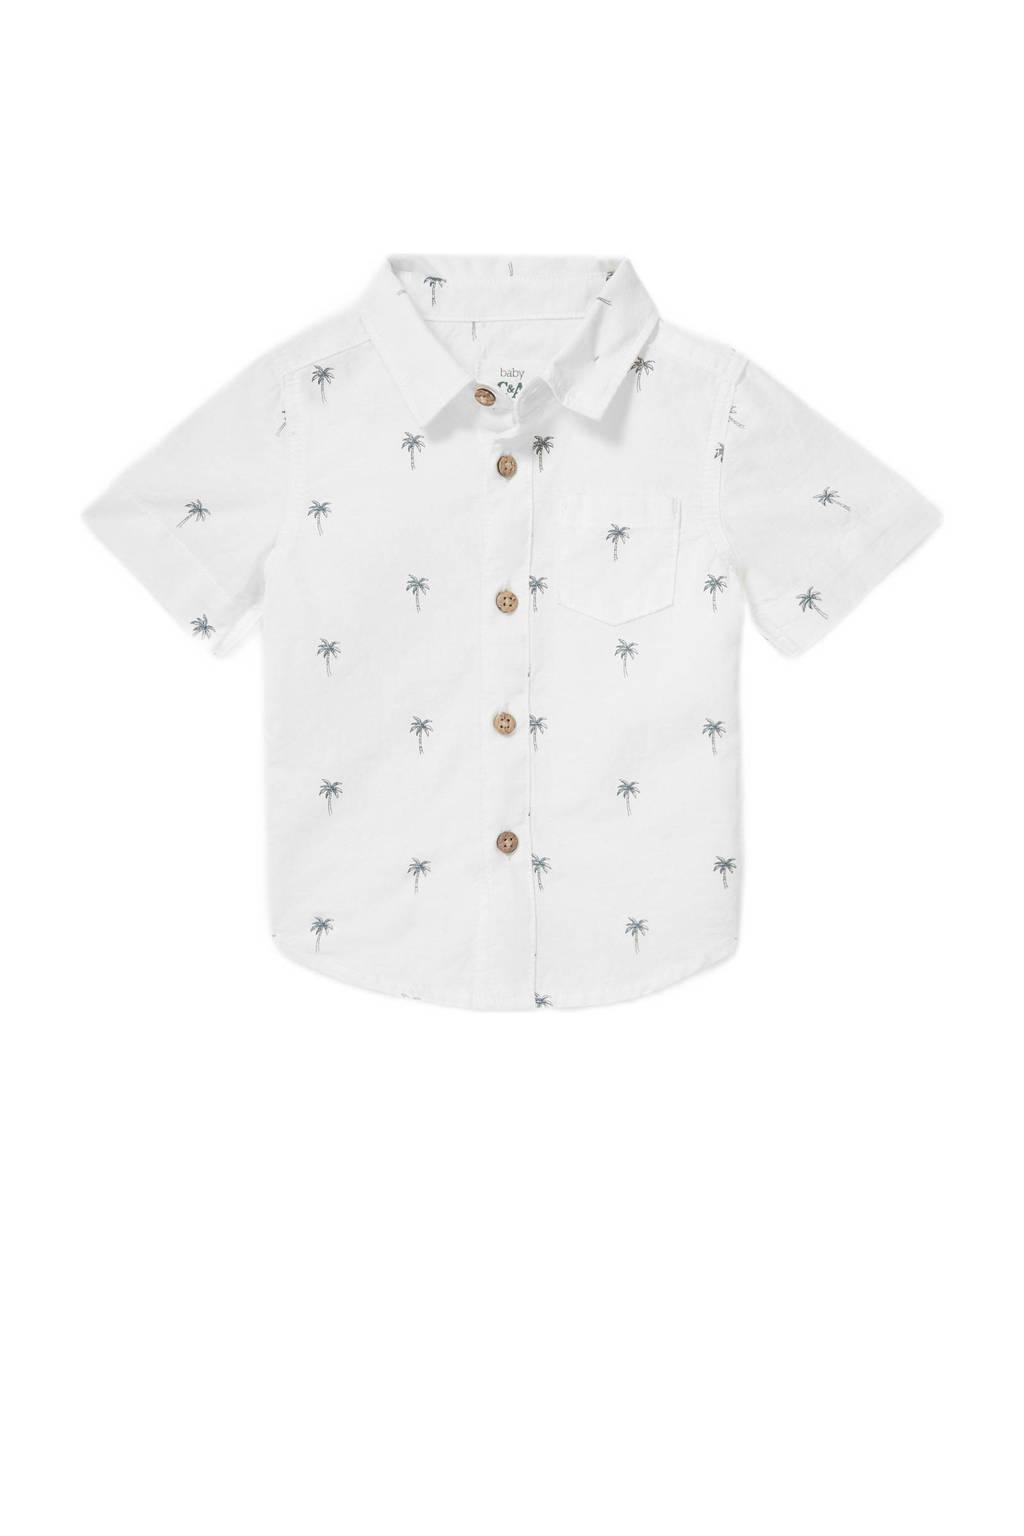 C&A Baby Club baby overhemd met all over print ecru, Ecru